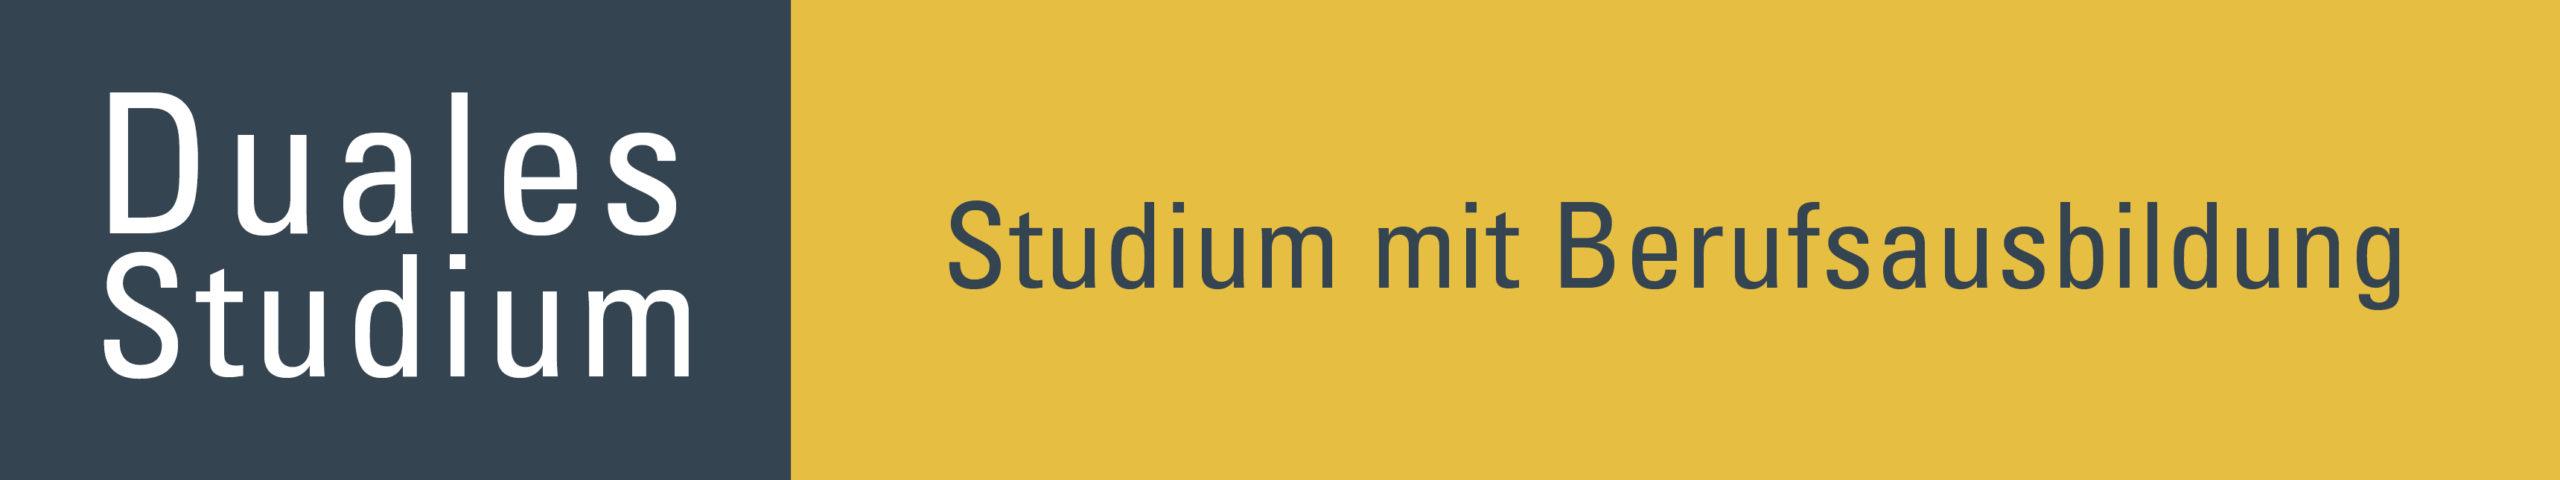 Dual studieren Logo